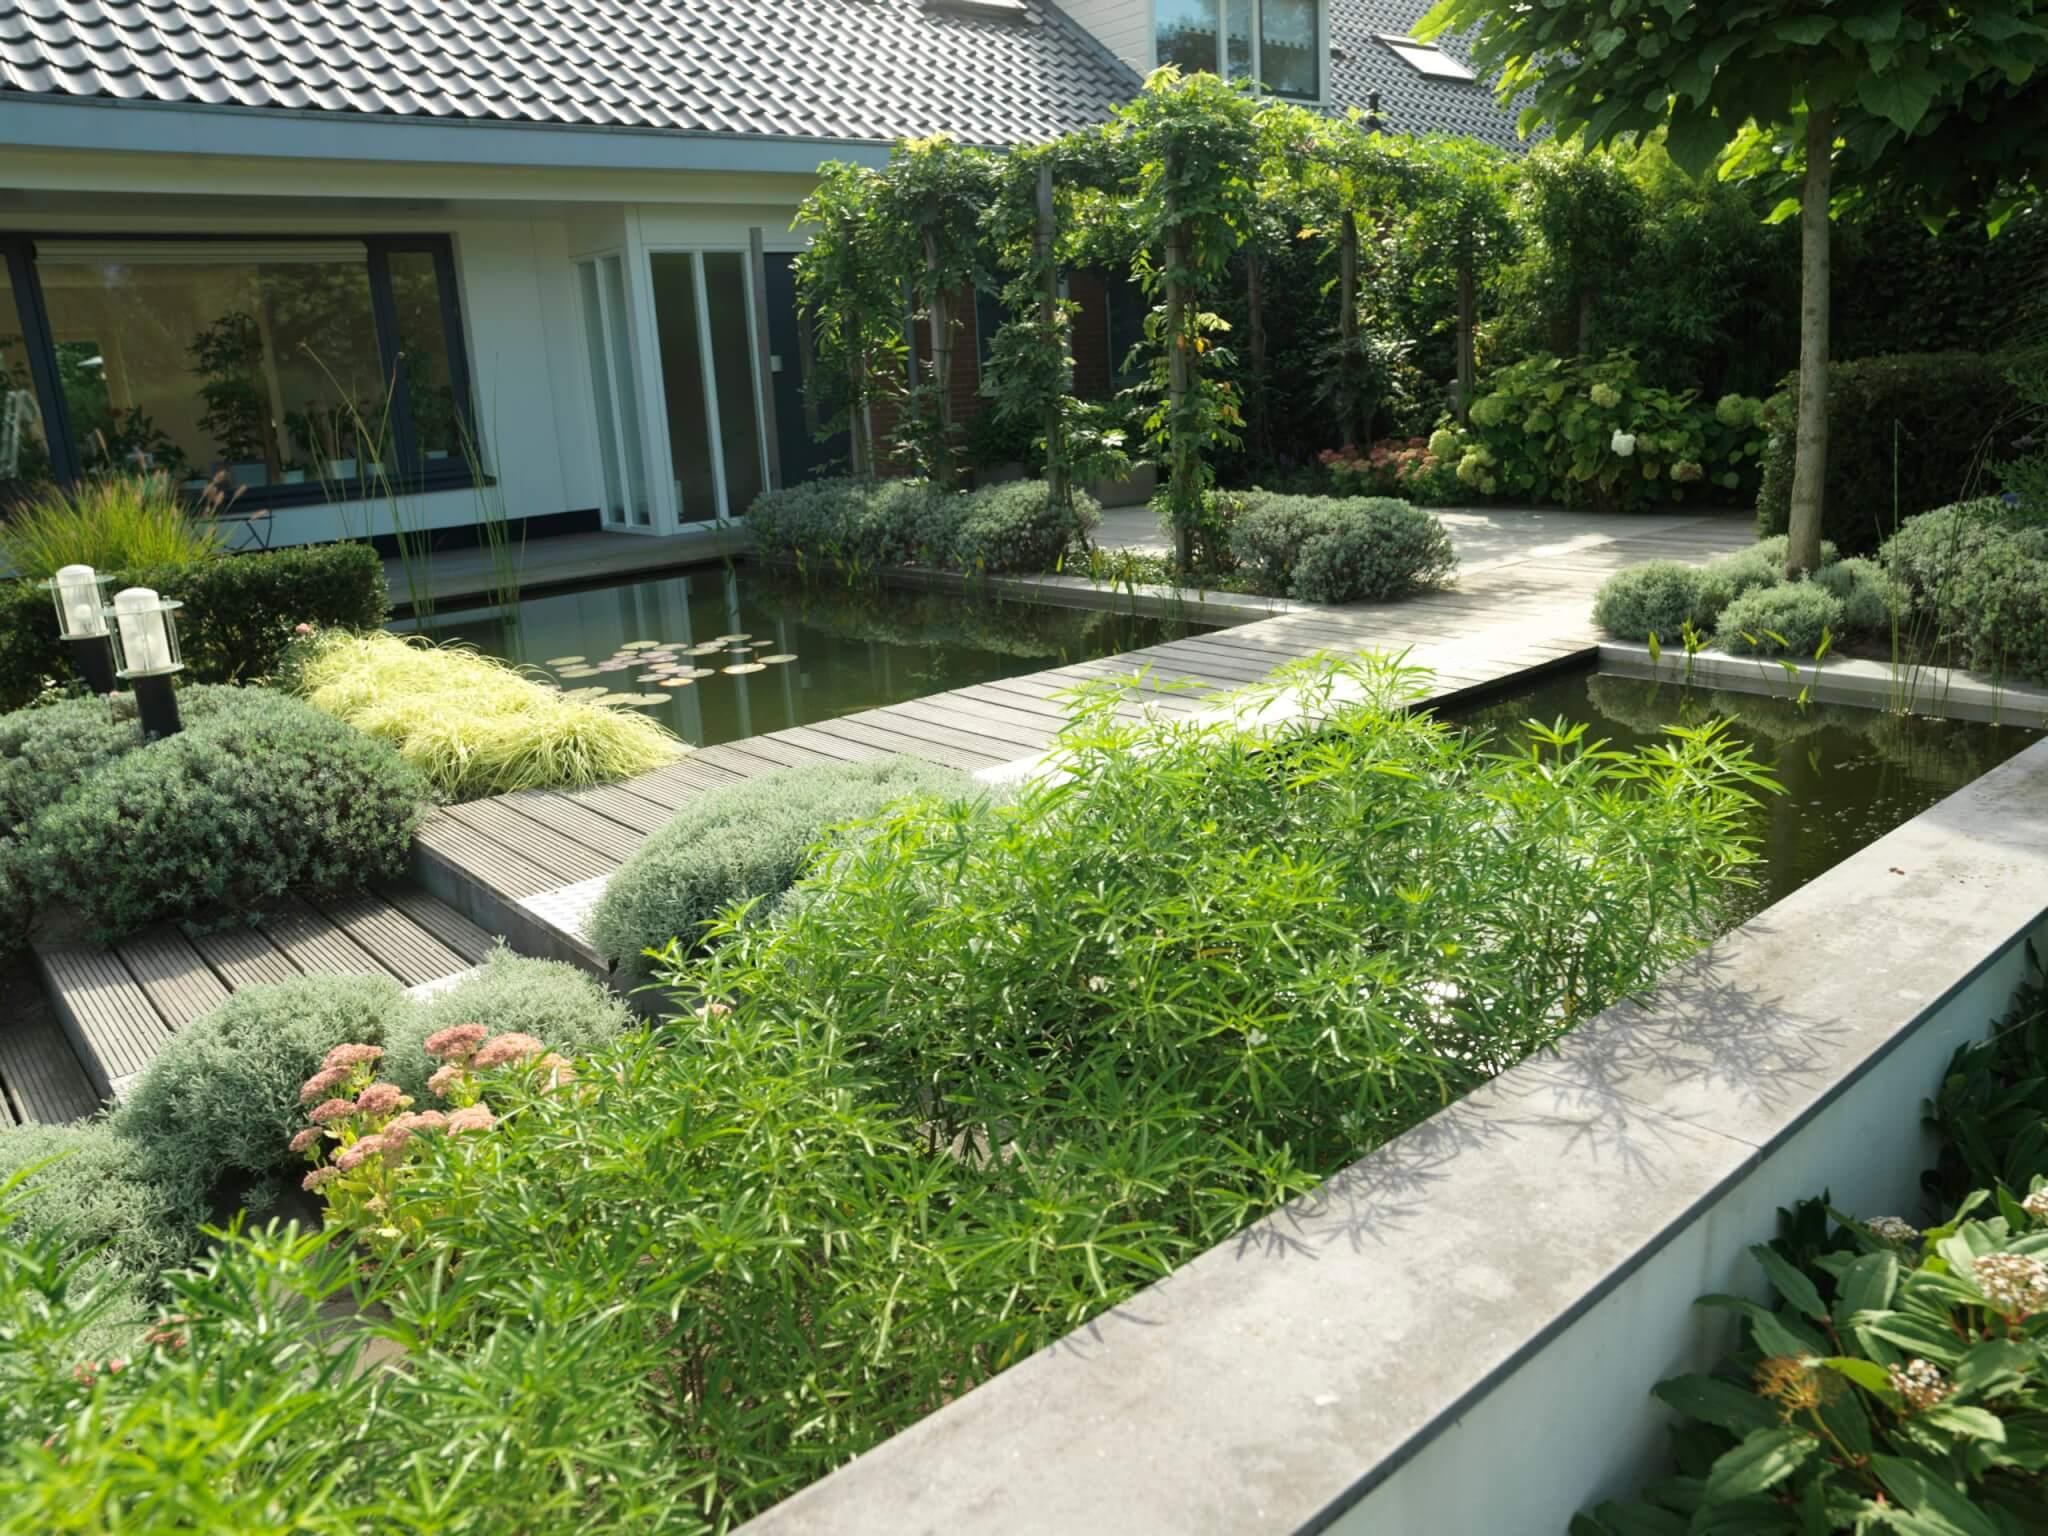 Voorbeeld aanleg tuinontwerp met vijver